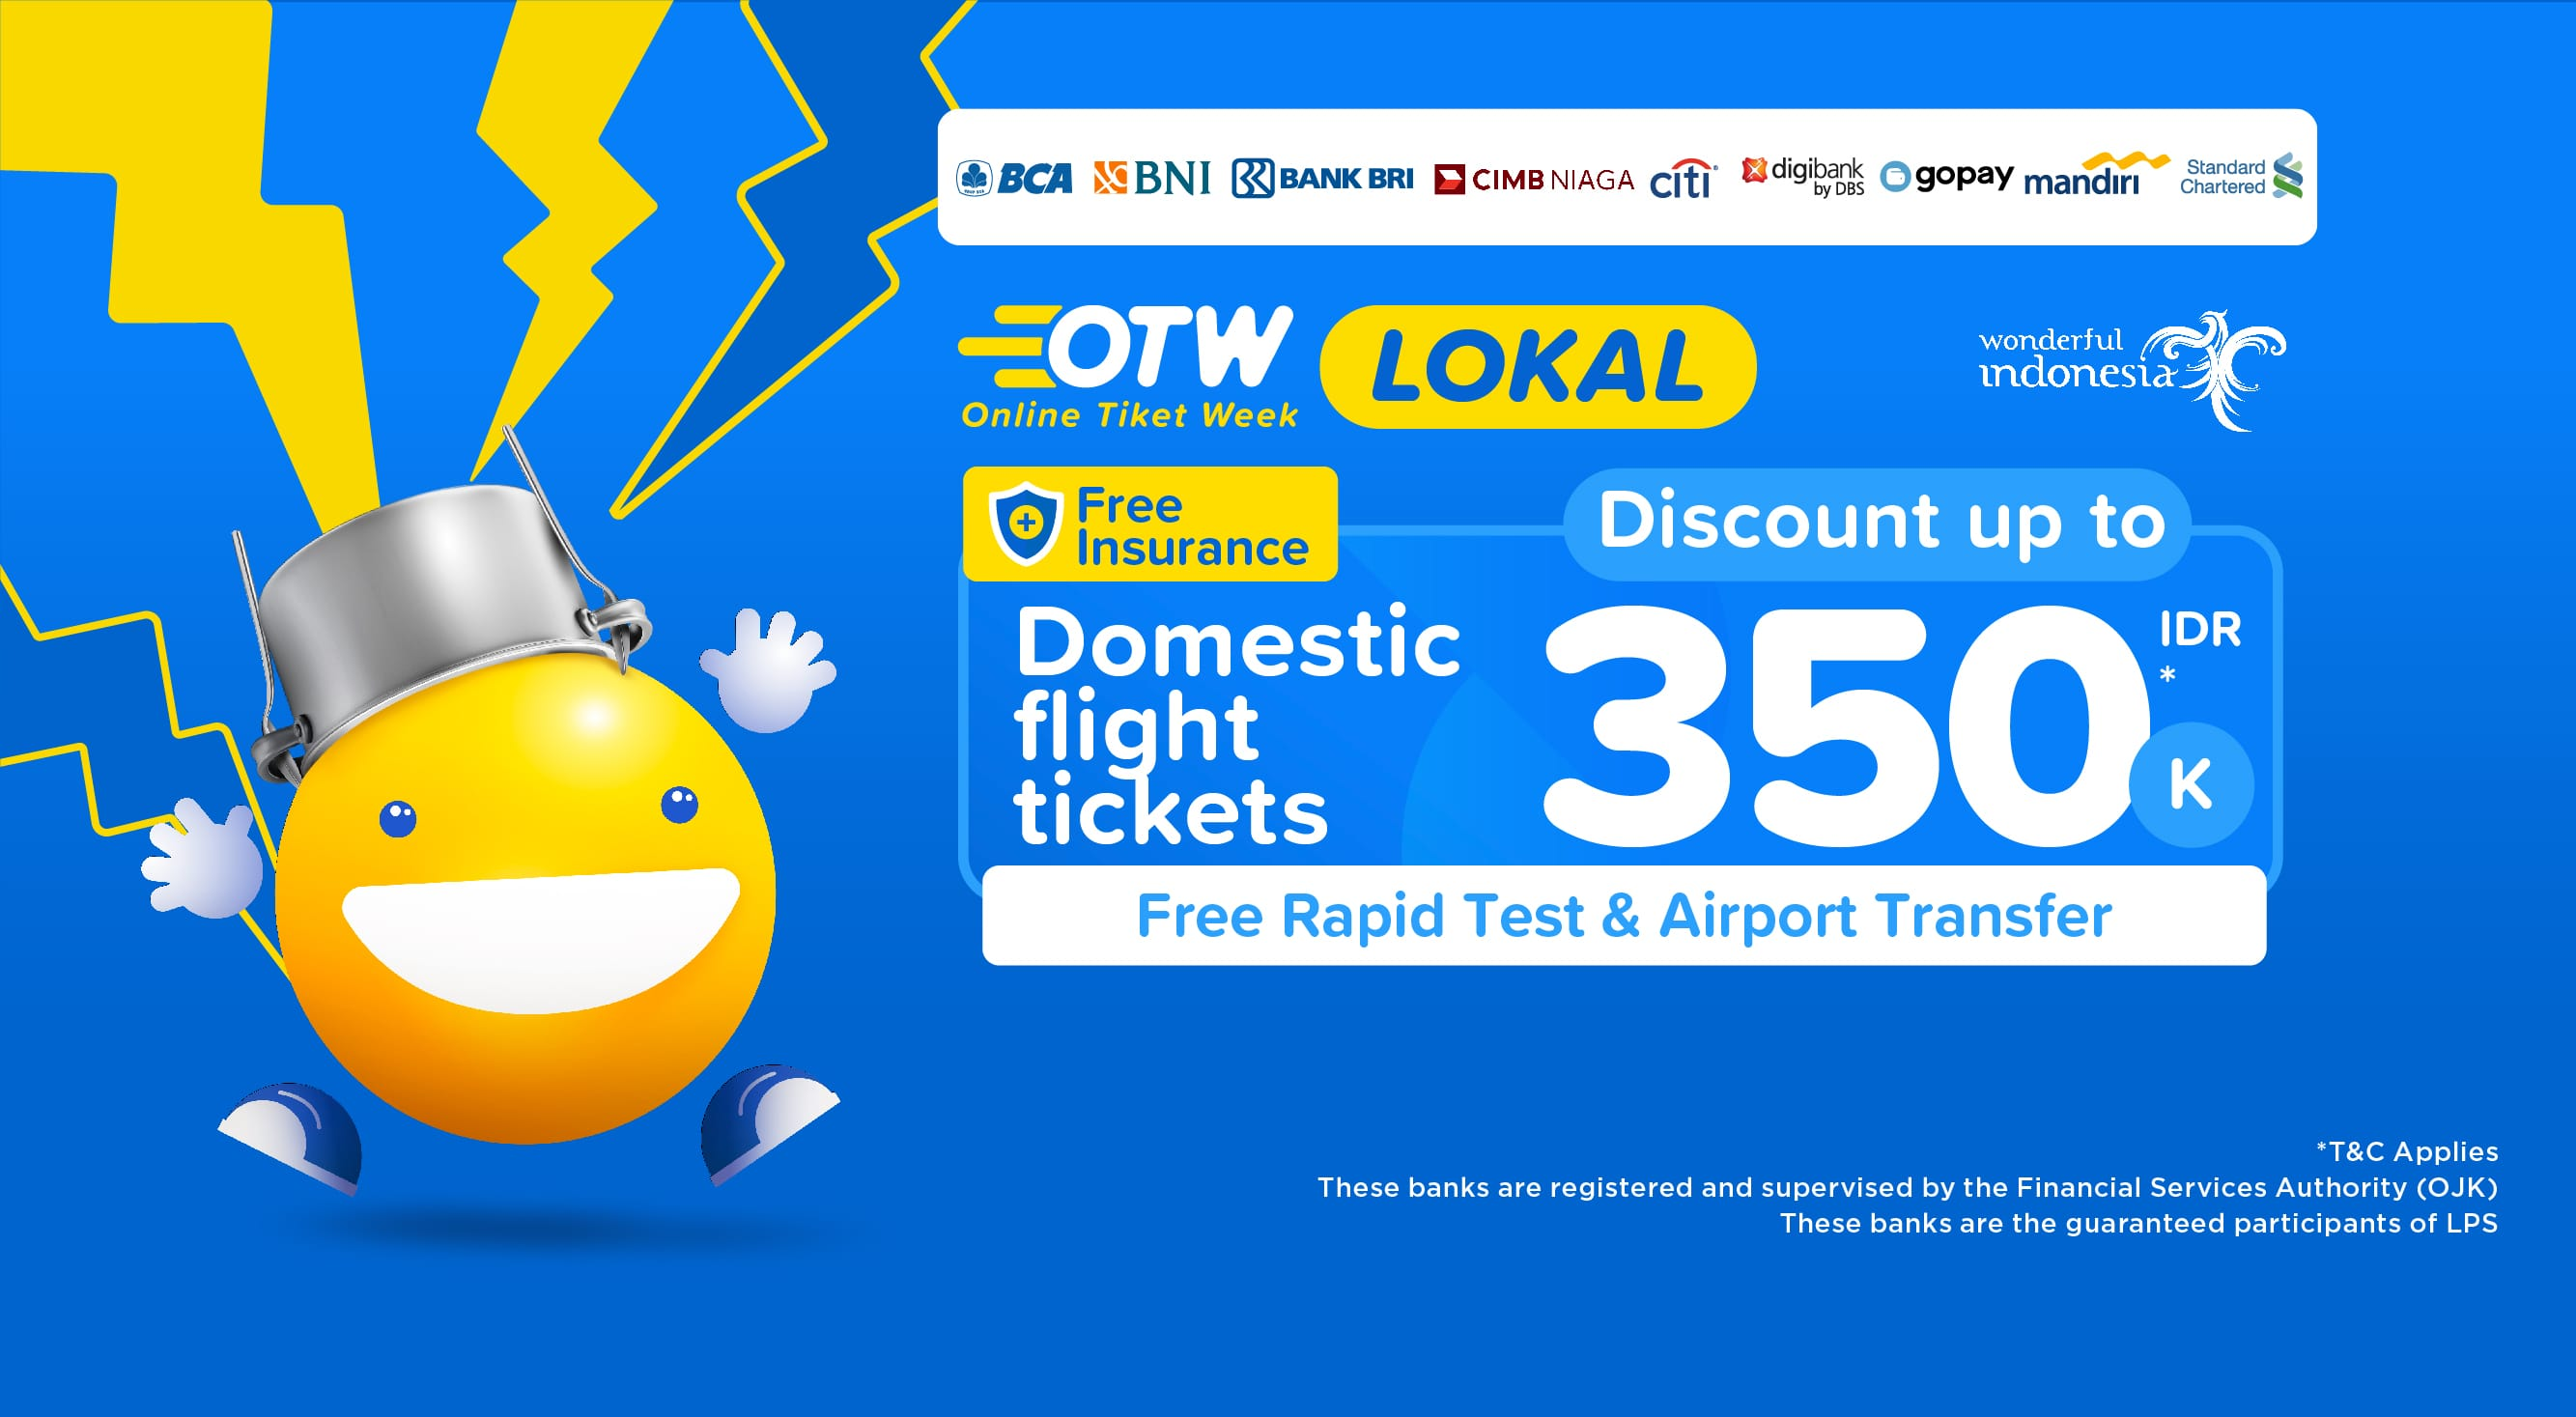 ⚡ OTW Lokal flight discount up to 350,000 IDR ⚡